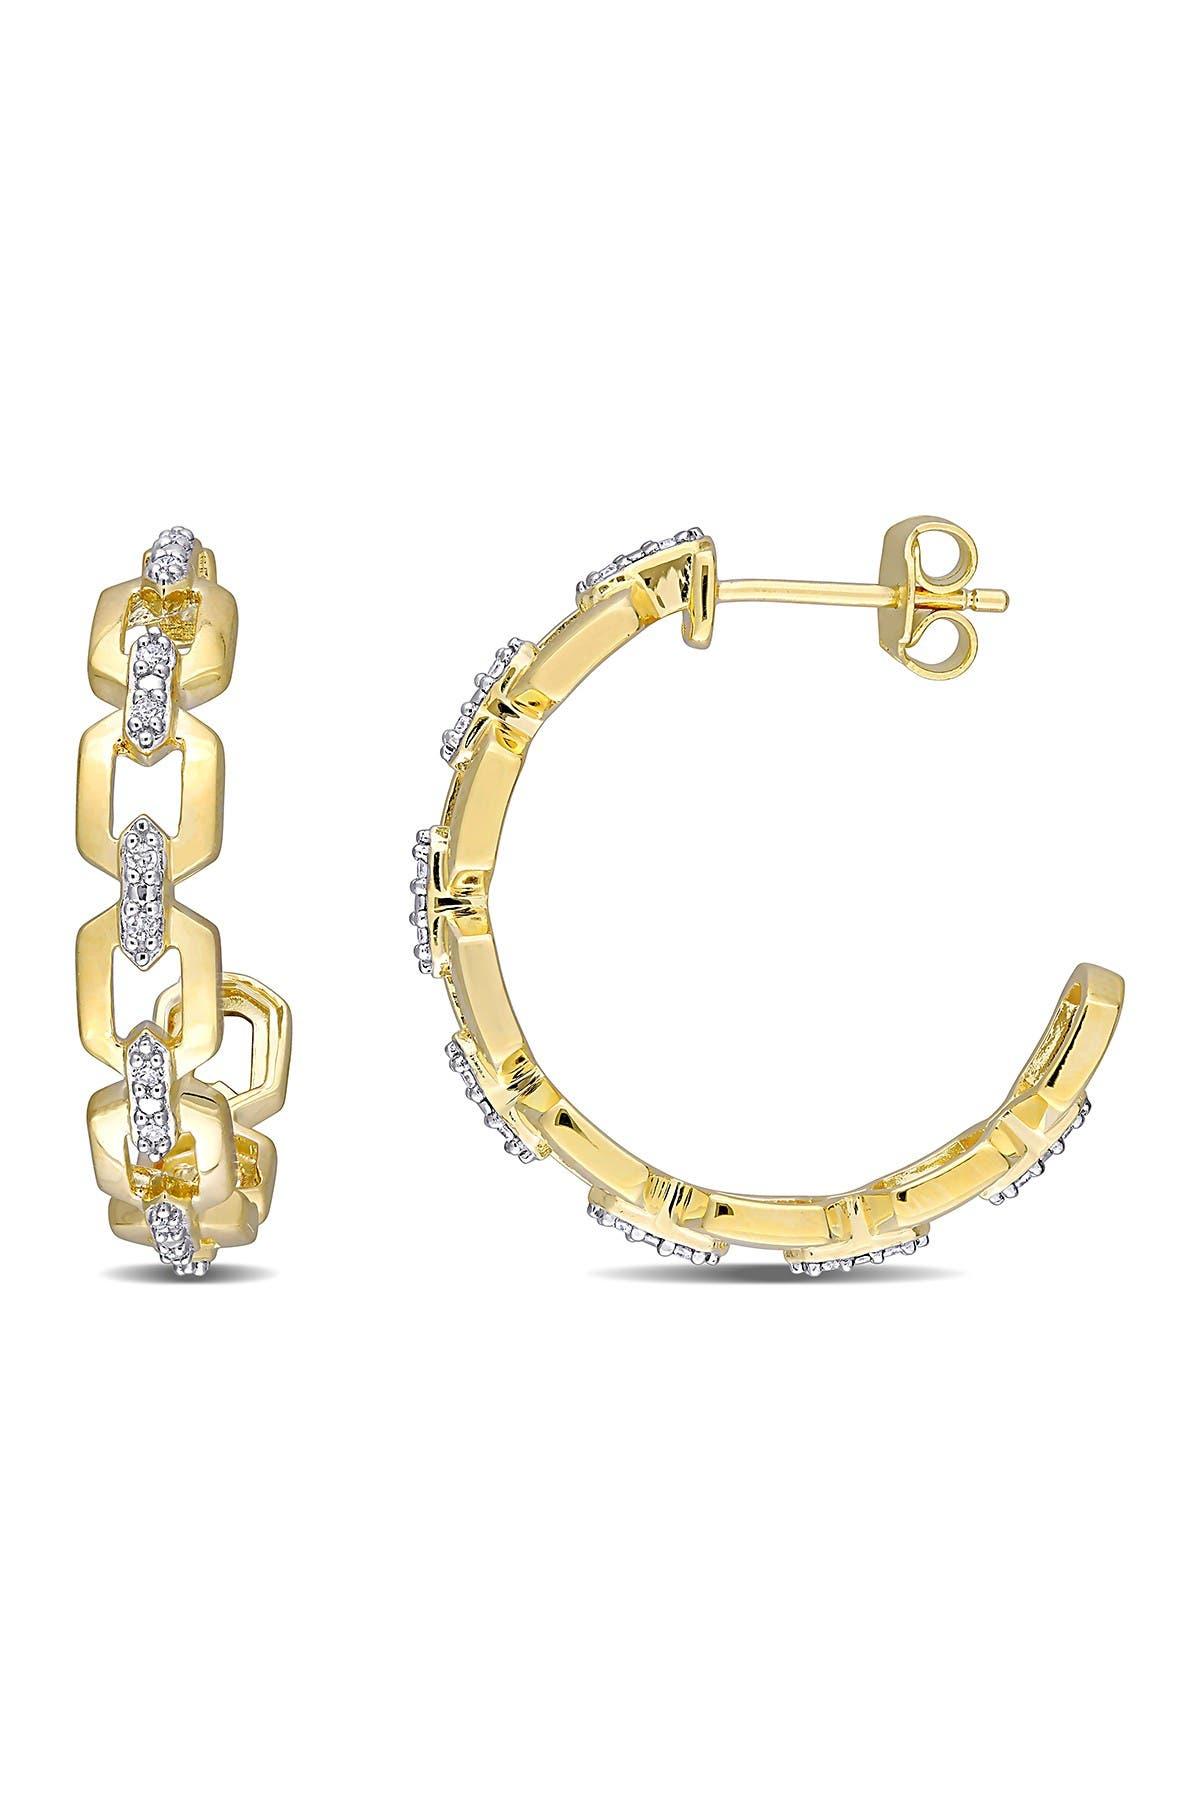 Image of Delmar 18K Yellow Gold Plated Sterling Silver Diamond Link 27.3mm Hoop Earrings - 0.14 ctw